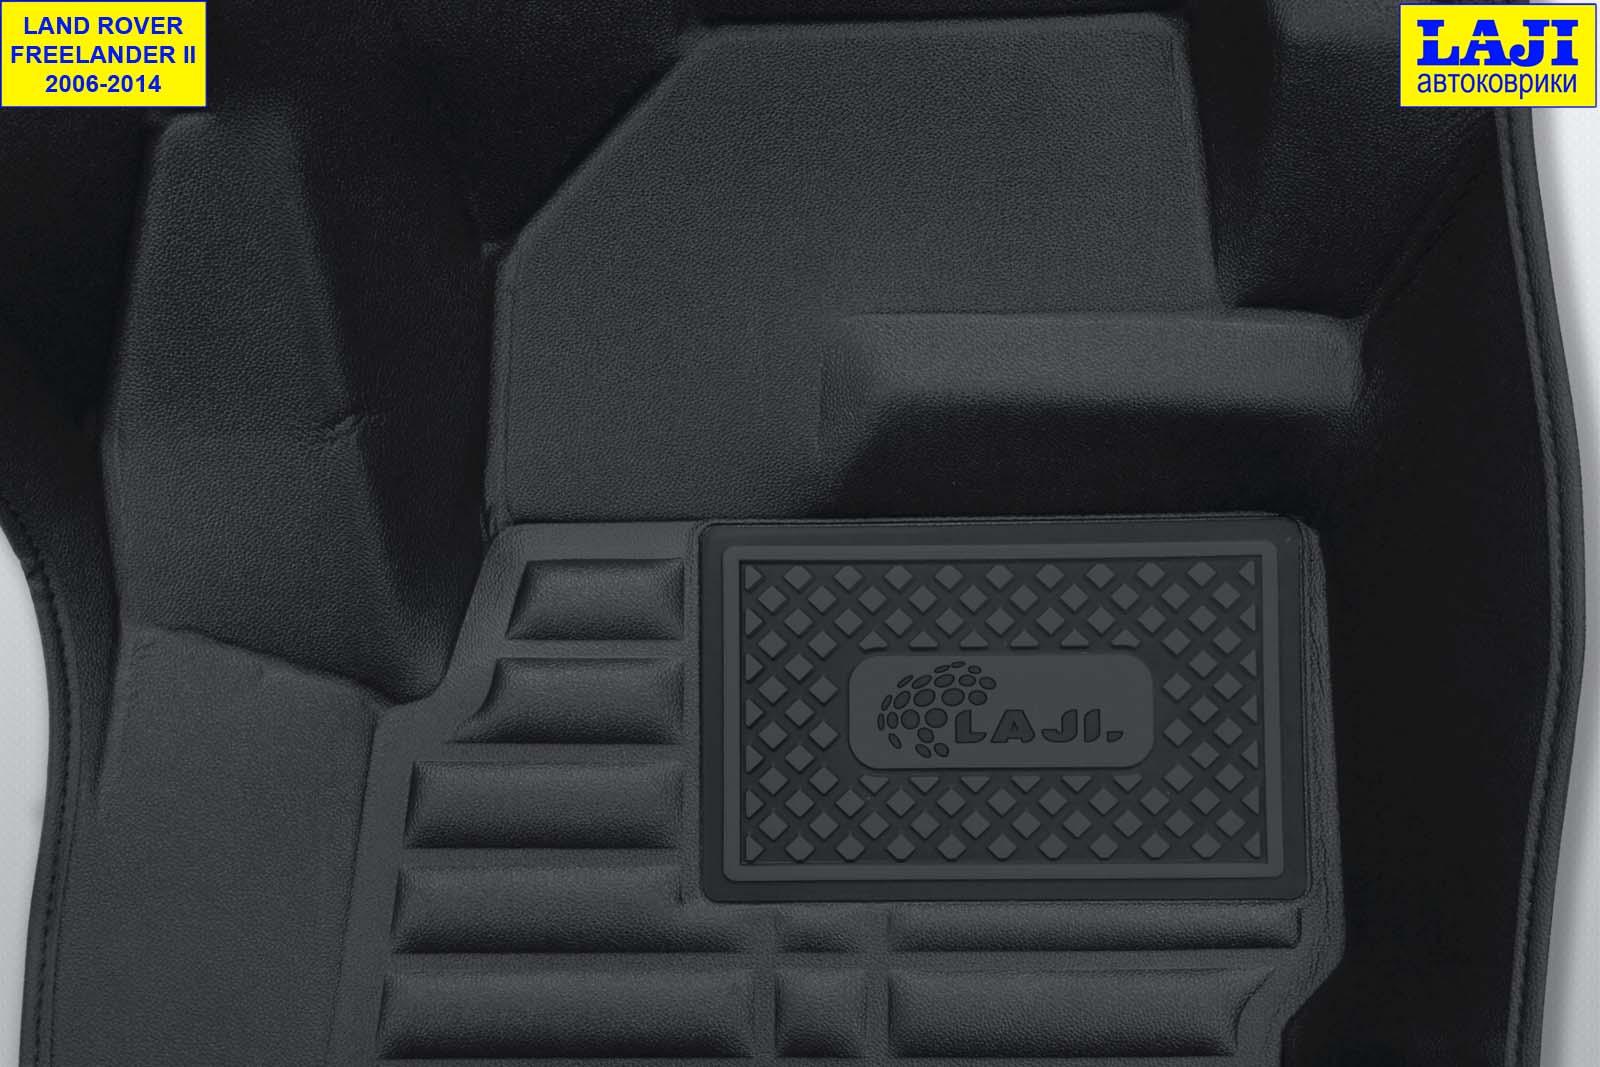 5D коврики в салон Land Rover Freelander 2 2006-2014 7